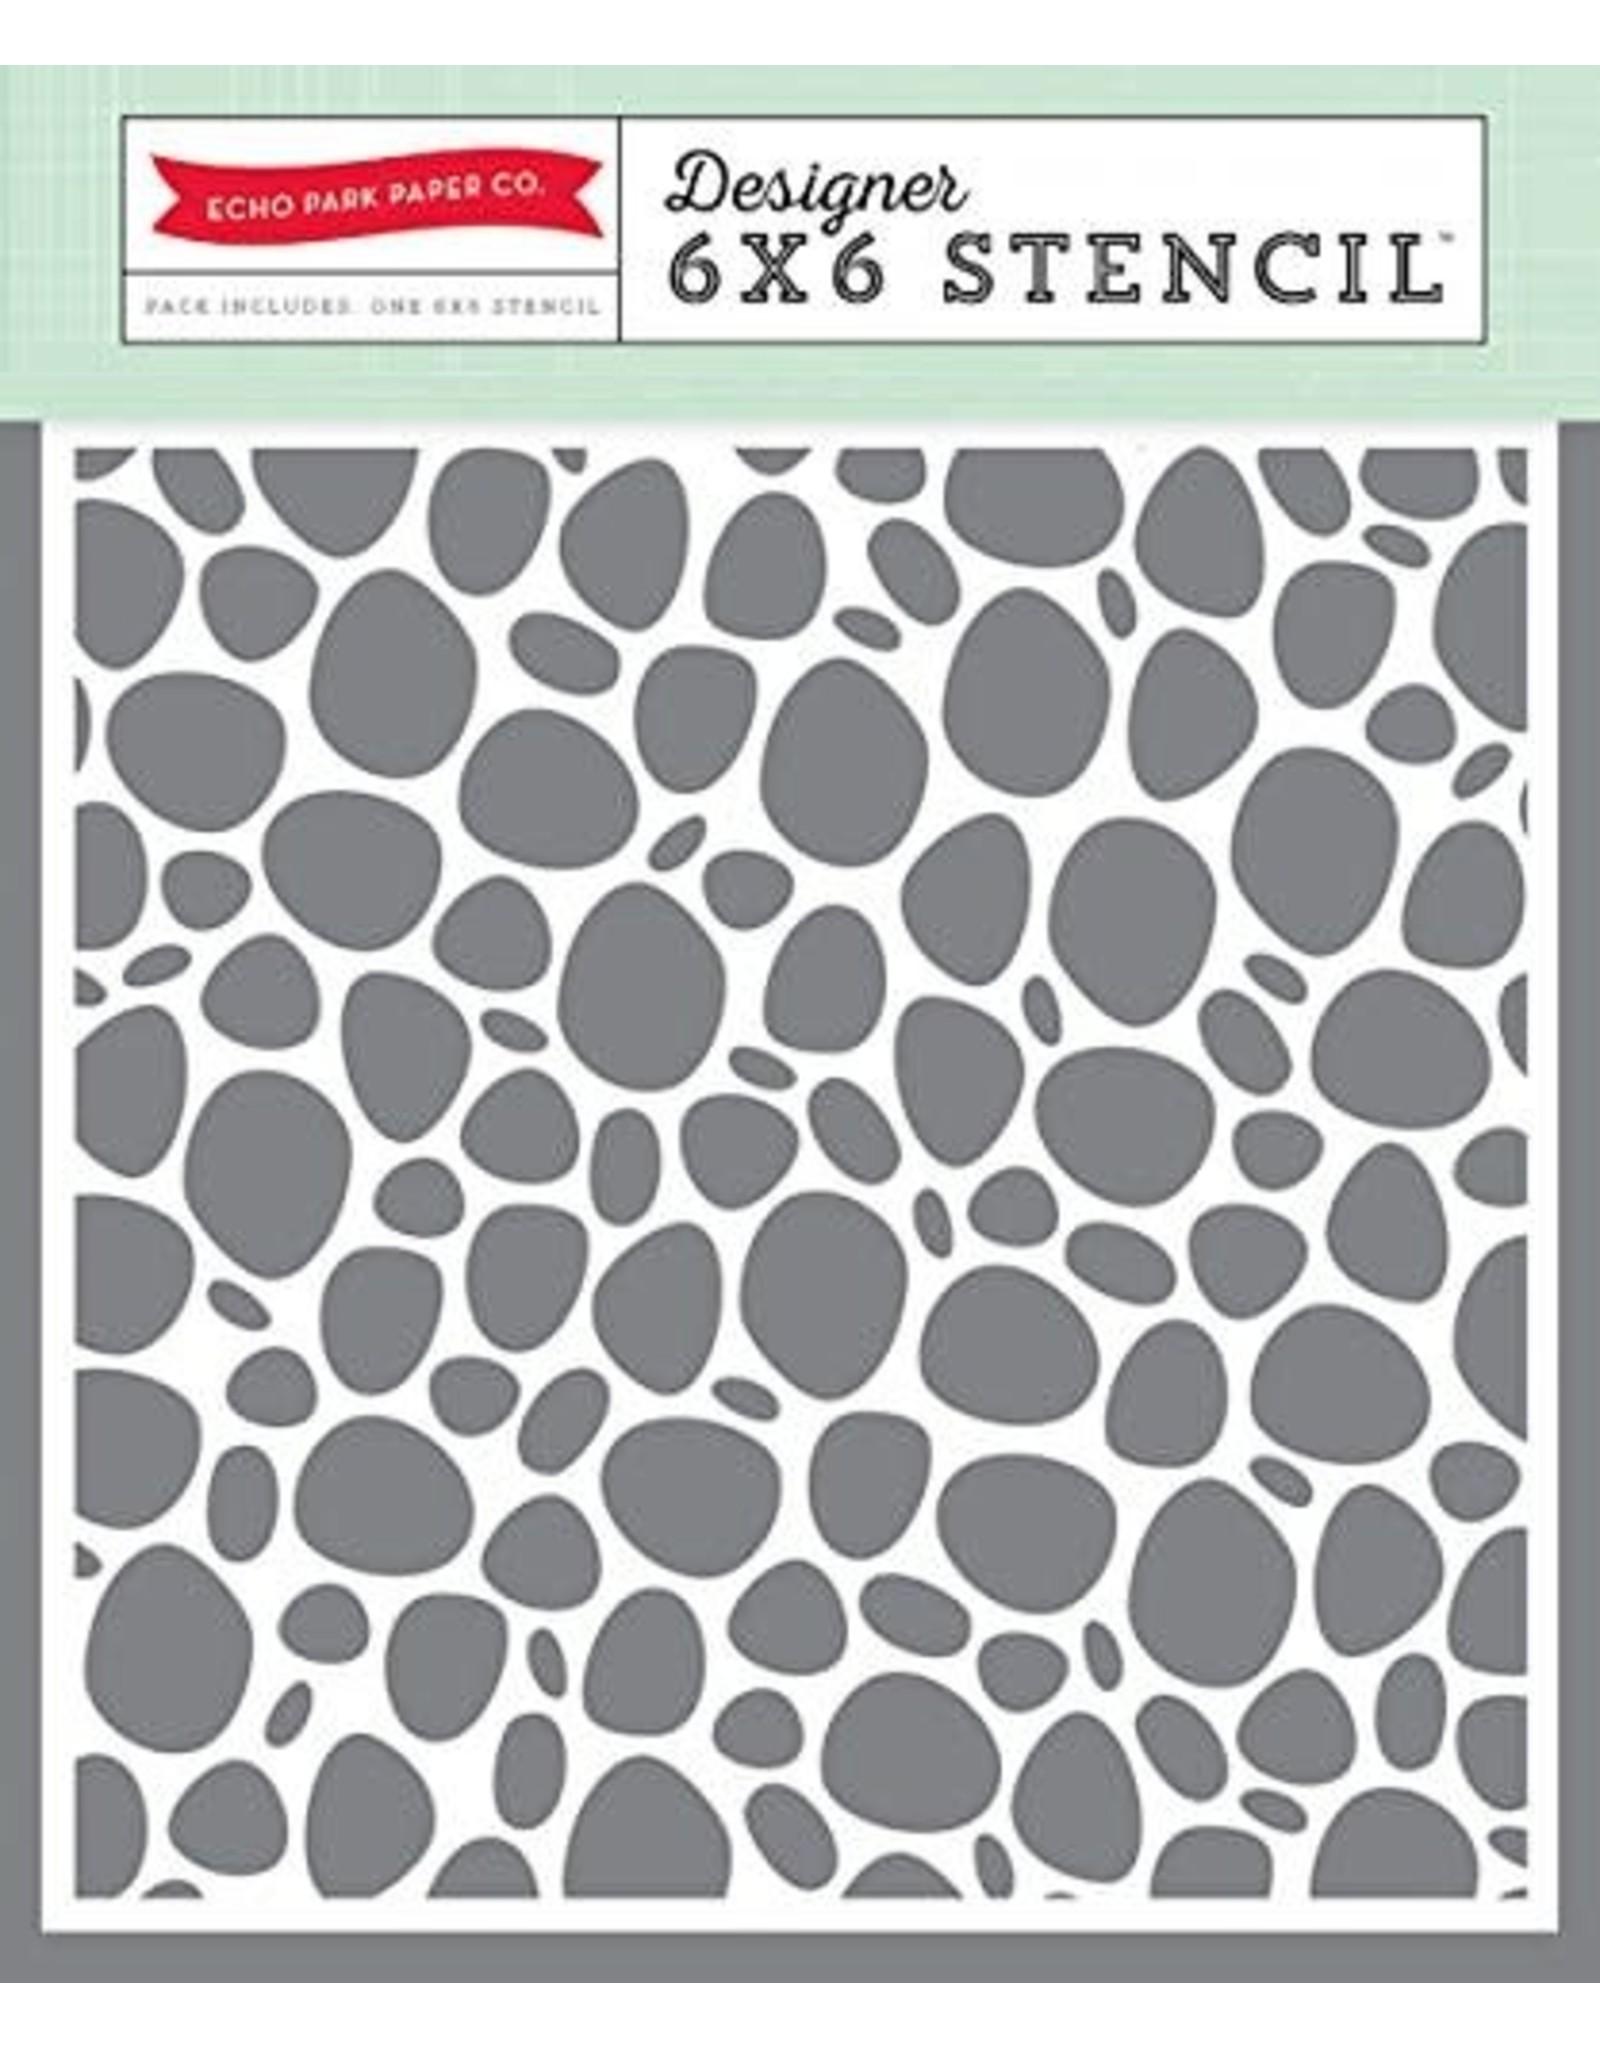 Echo Park Rock - 6x6 Stencil